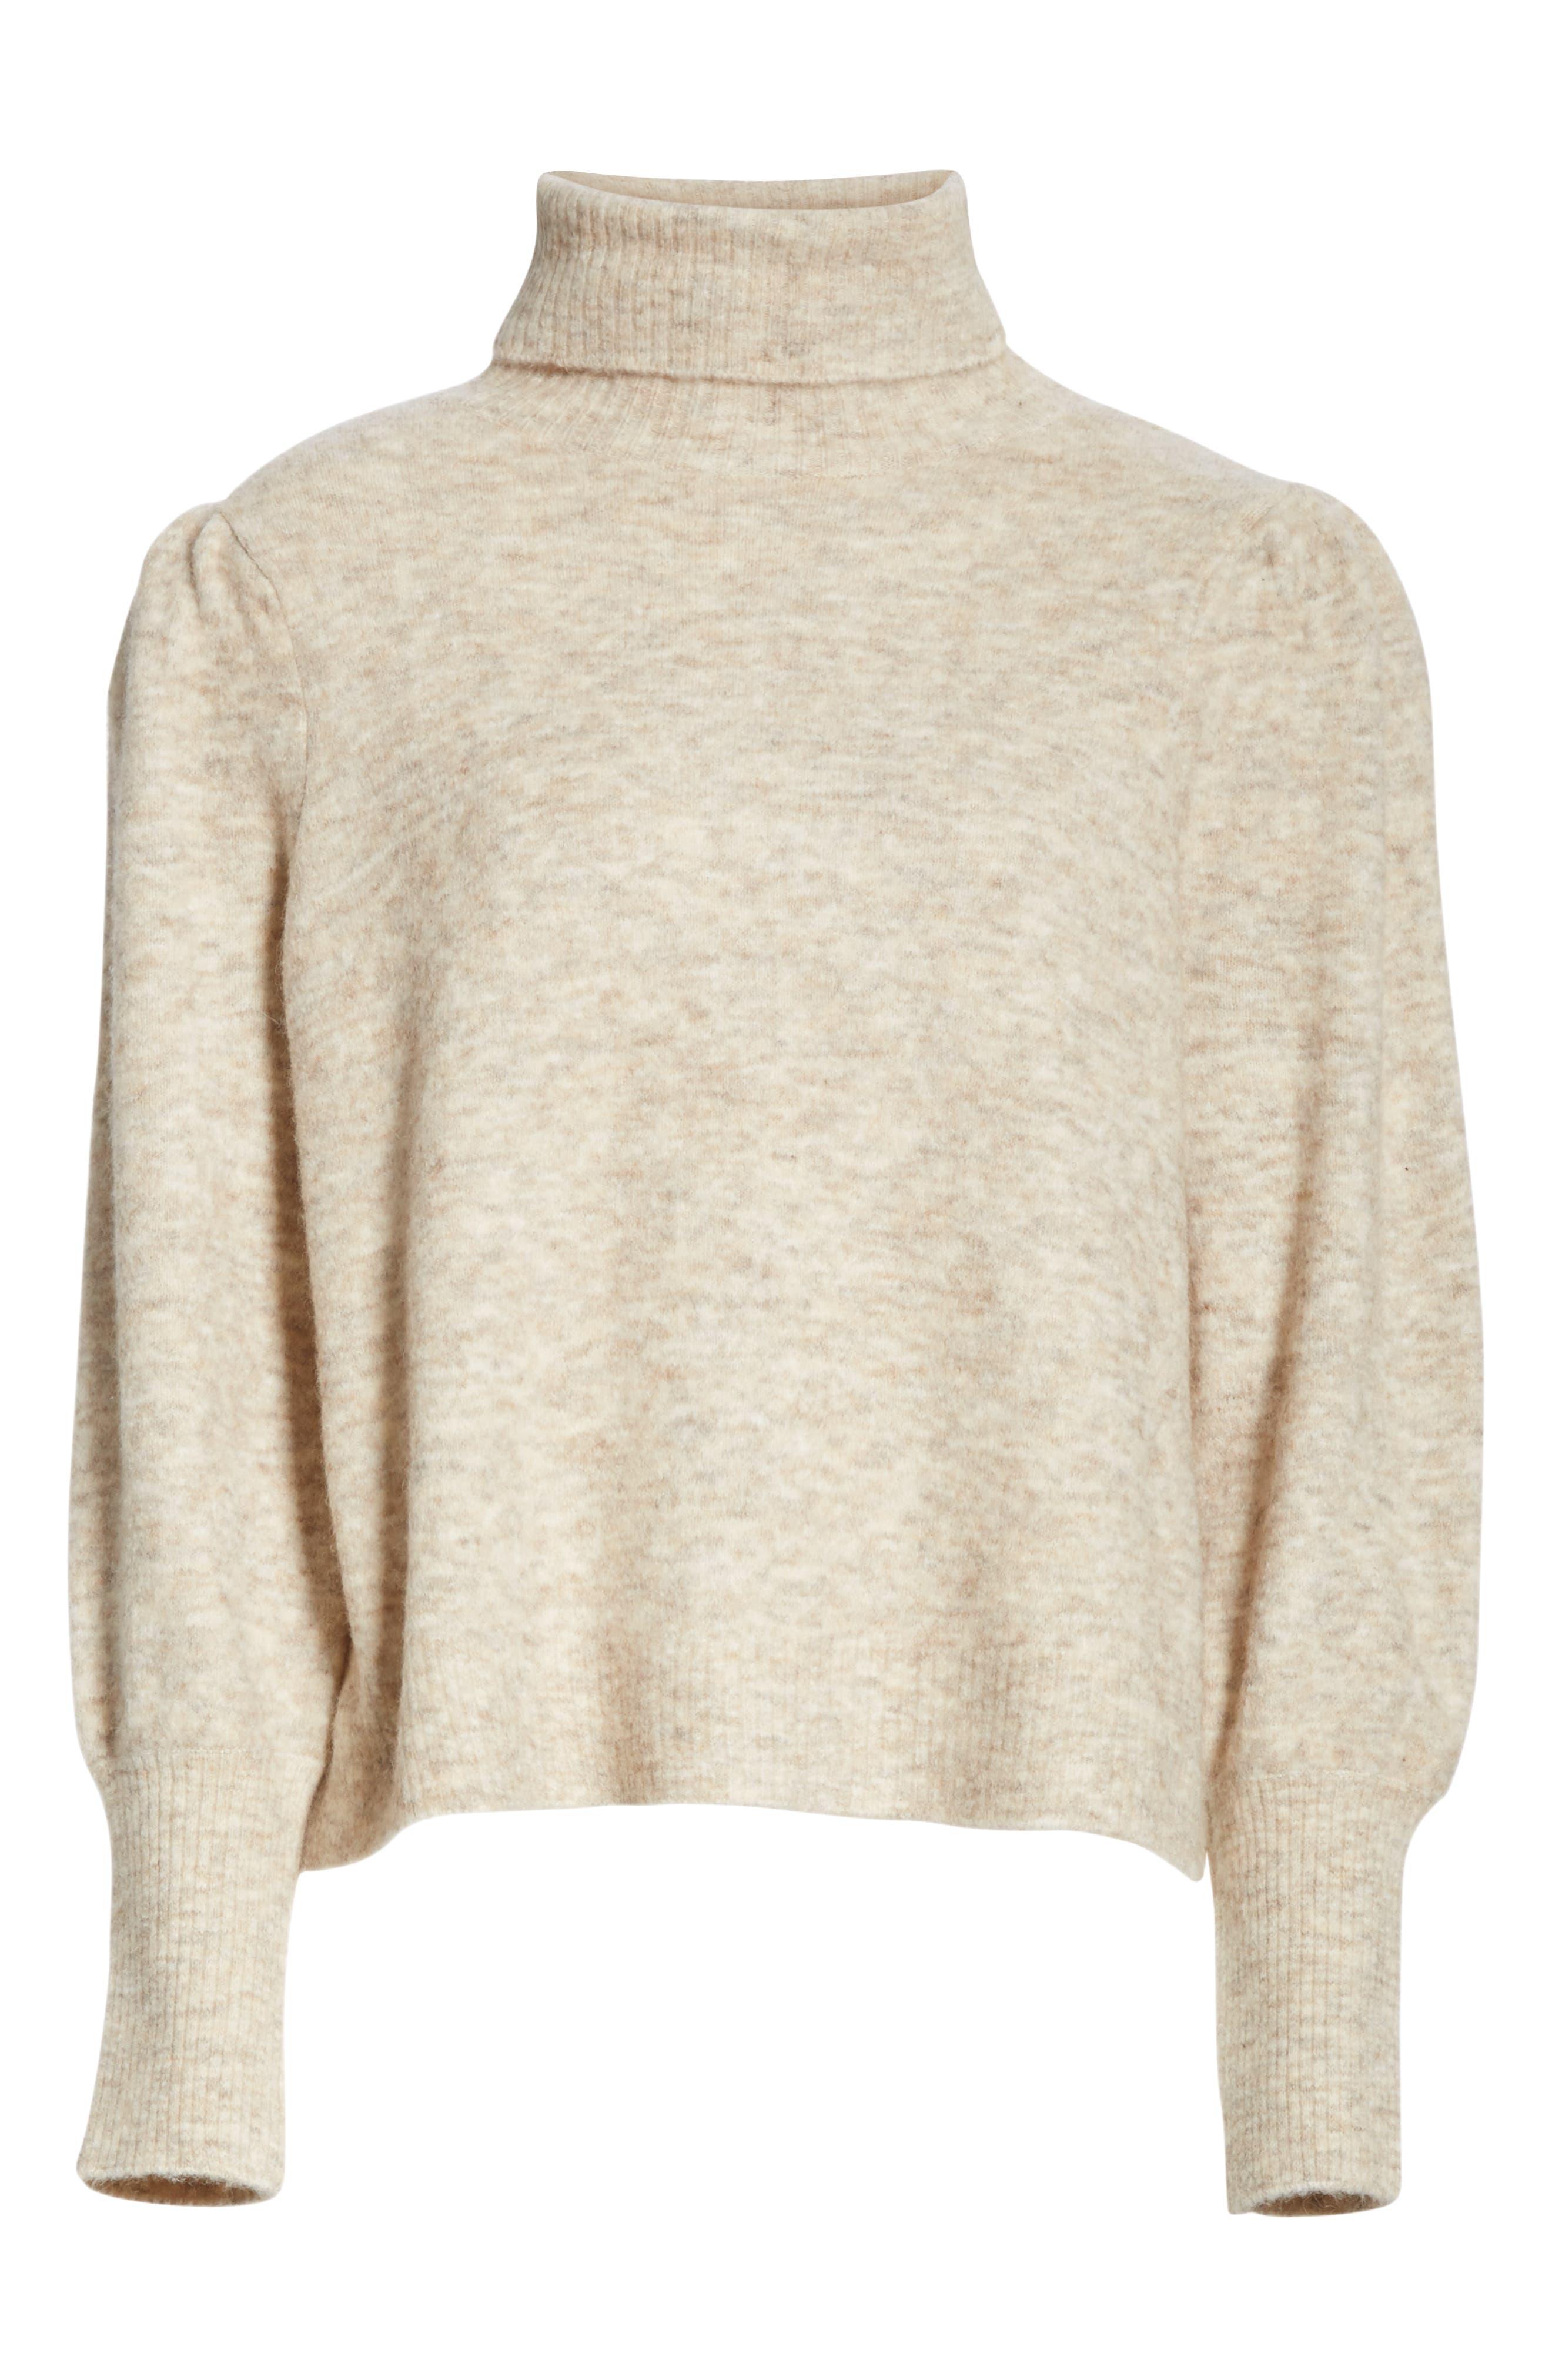 Swingy Turtleneck Sweater,                             Alternate thumbnail 6, color,                             OATMEAL